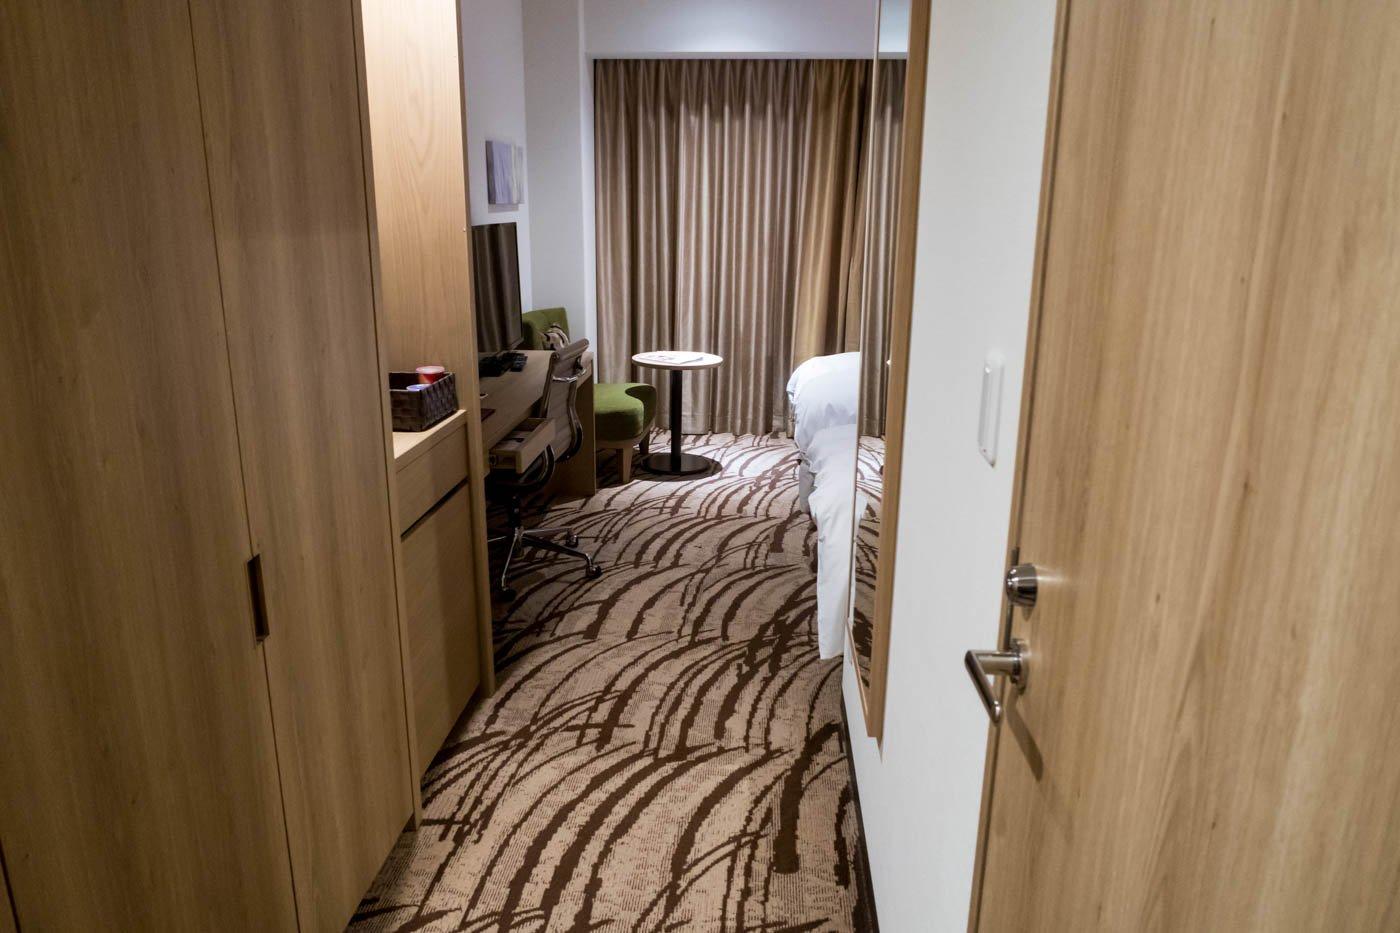 ANA Crowne Plaza Chitose Room